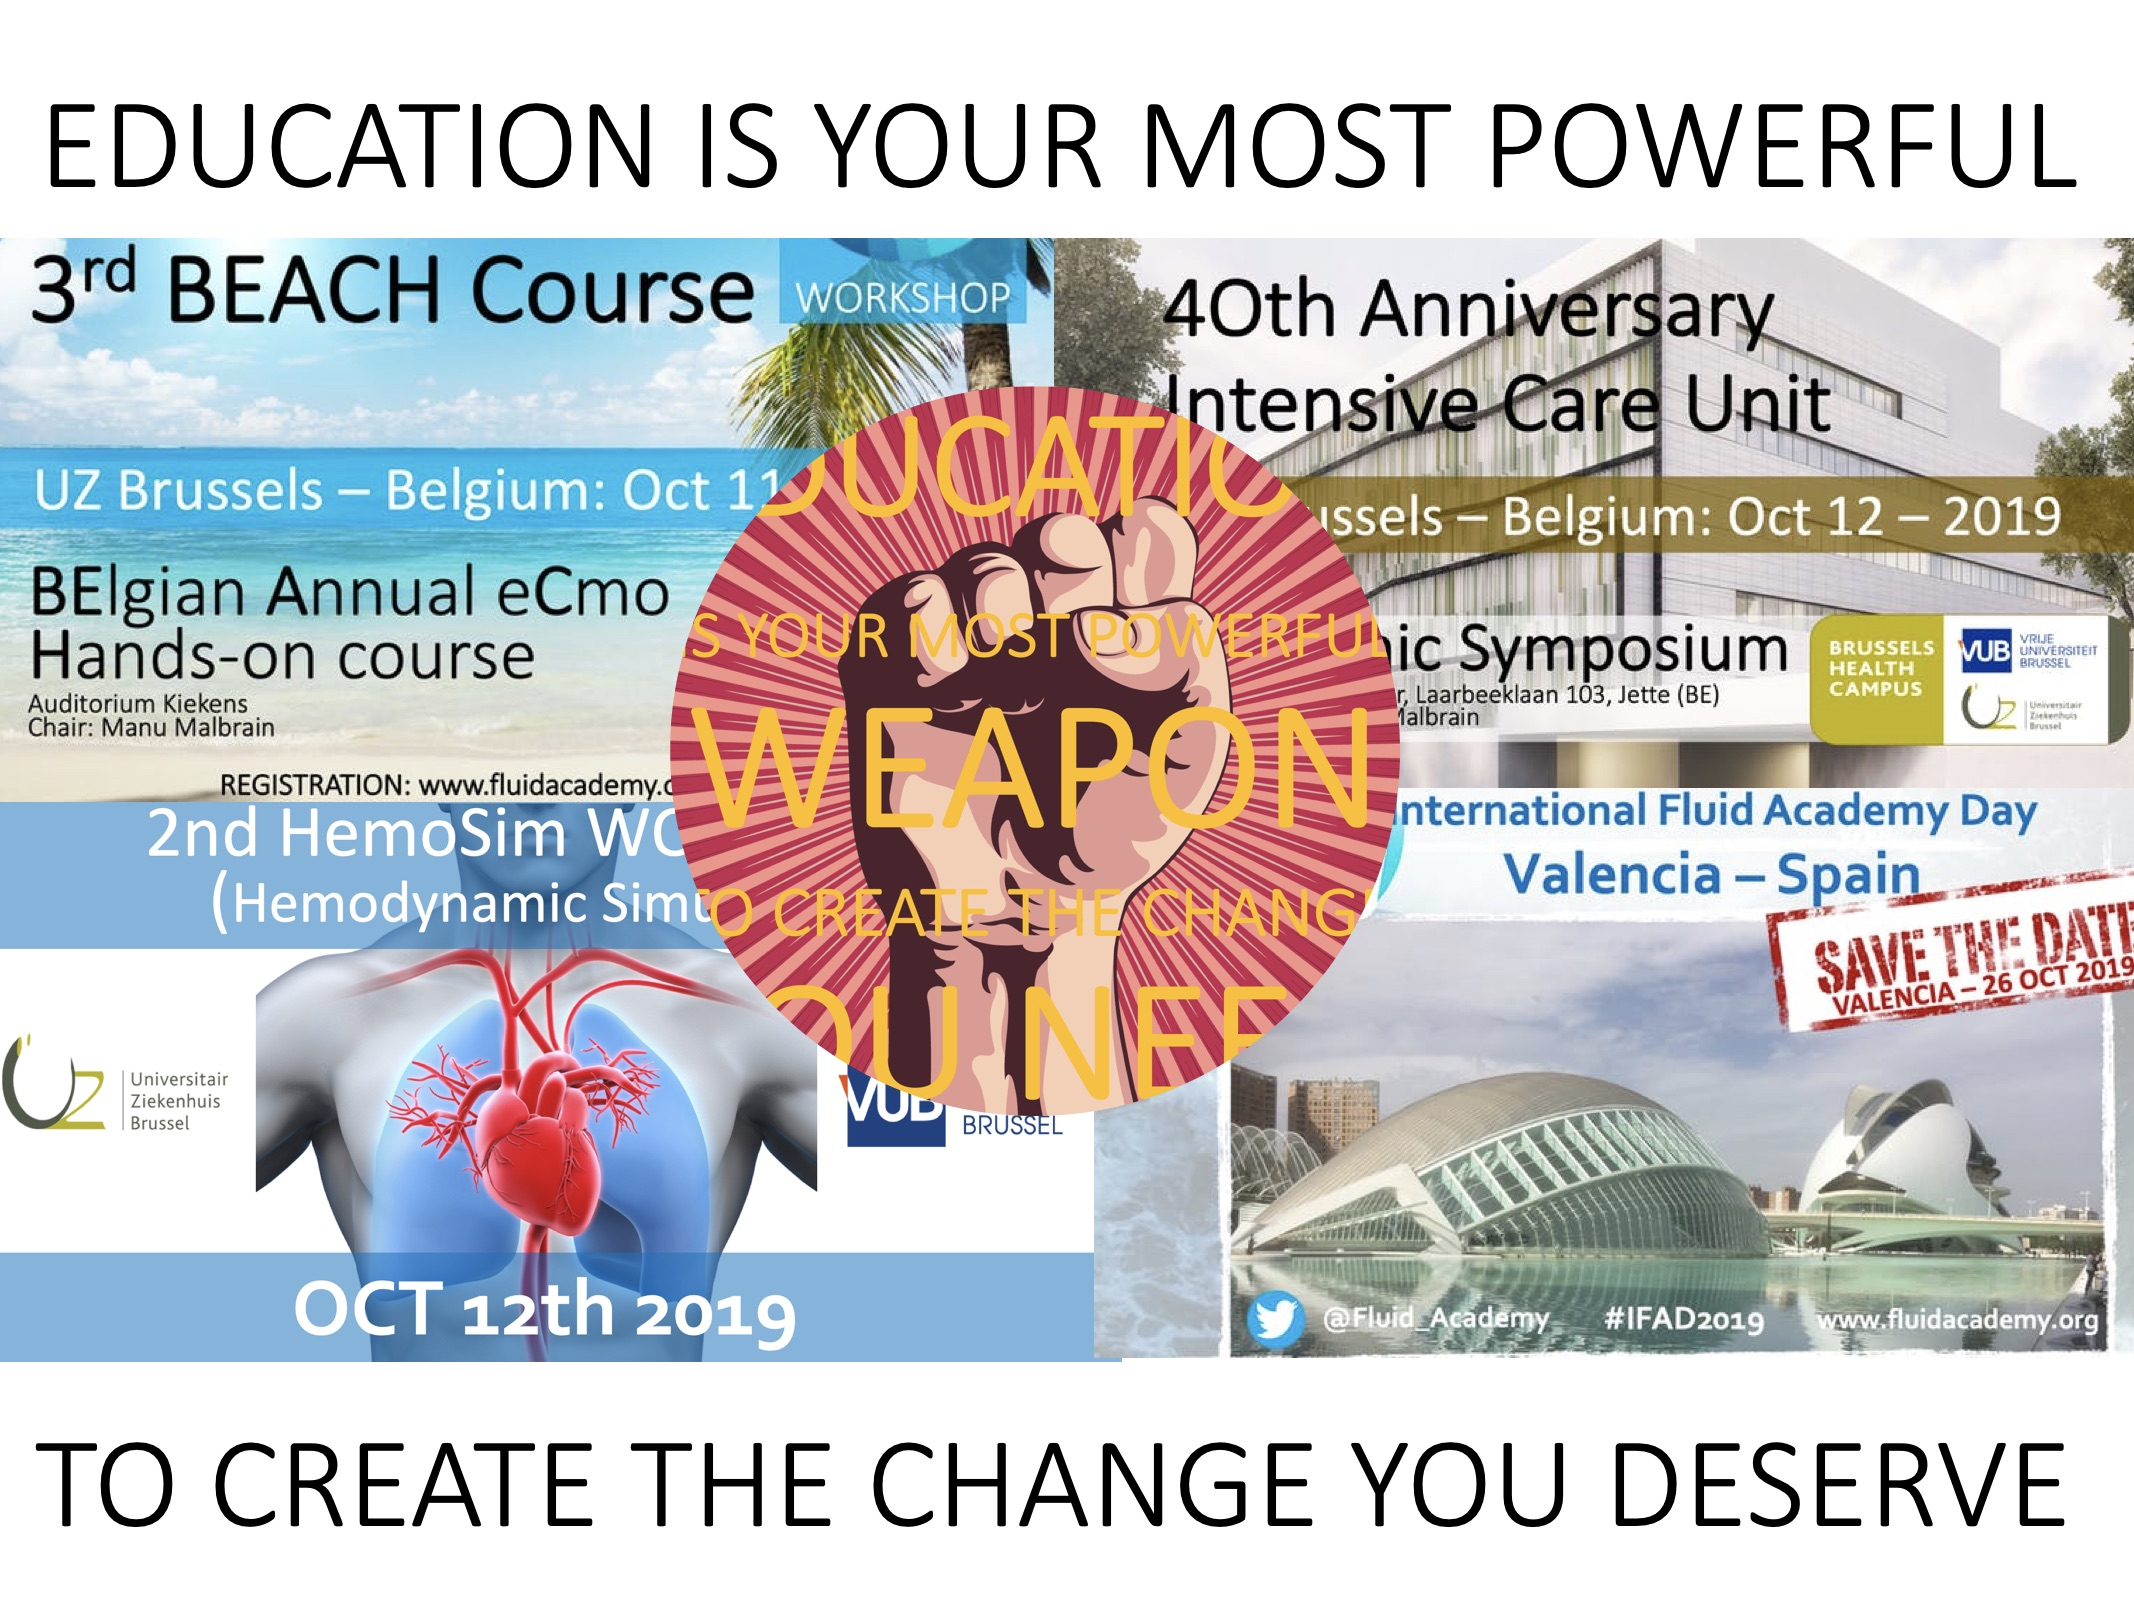 3rd BEACH course (BElgian Annual eCmo Hands-on)